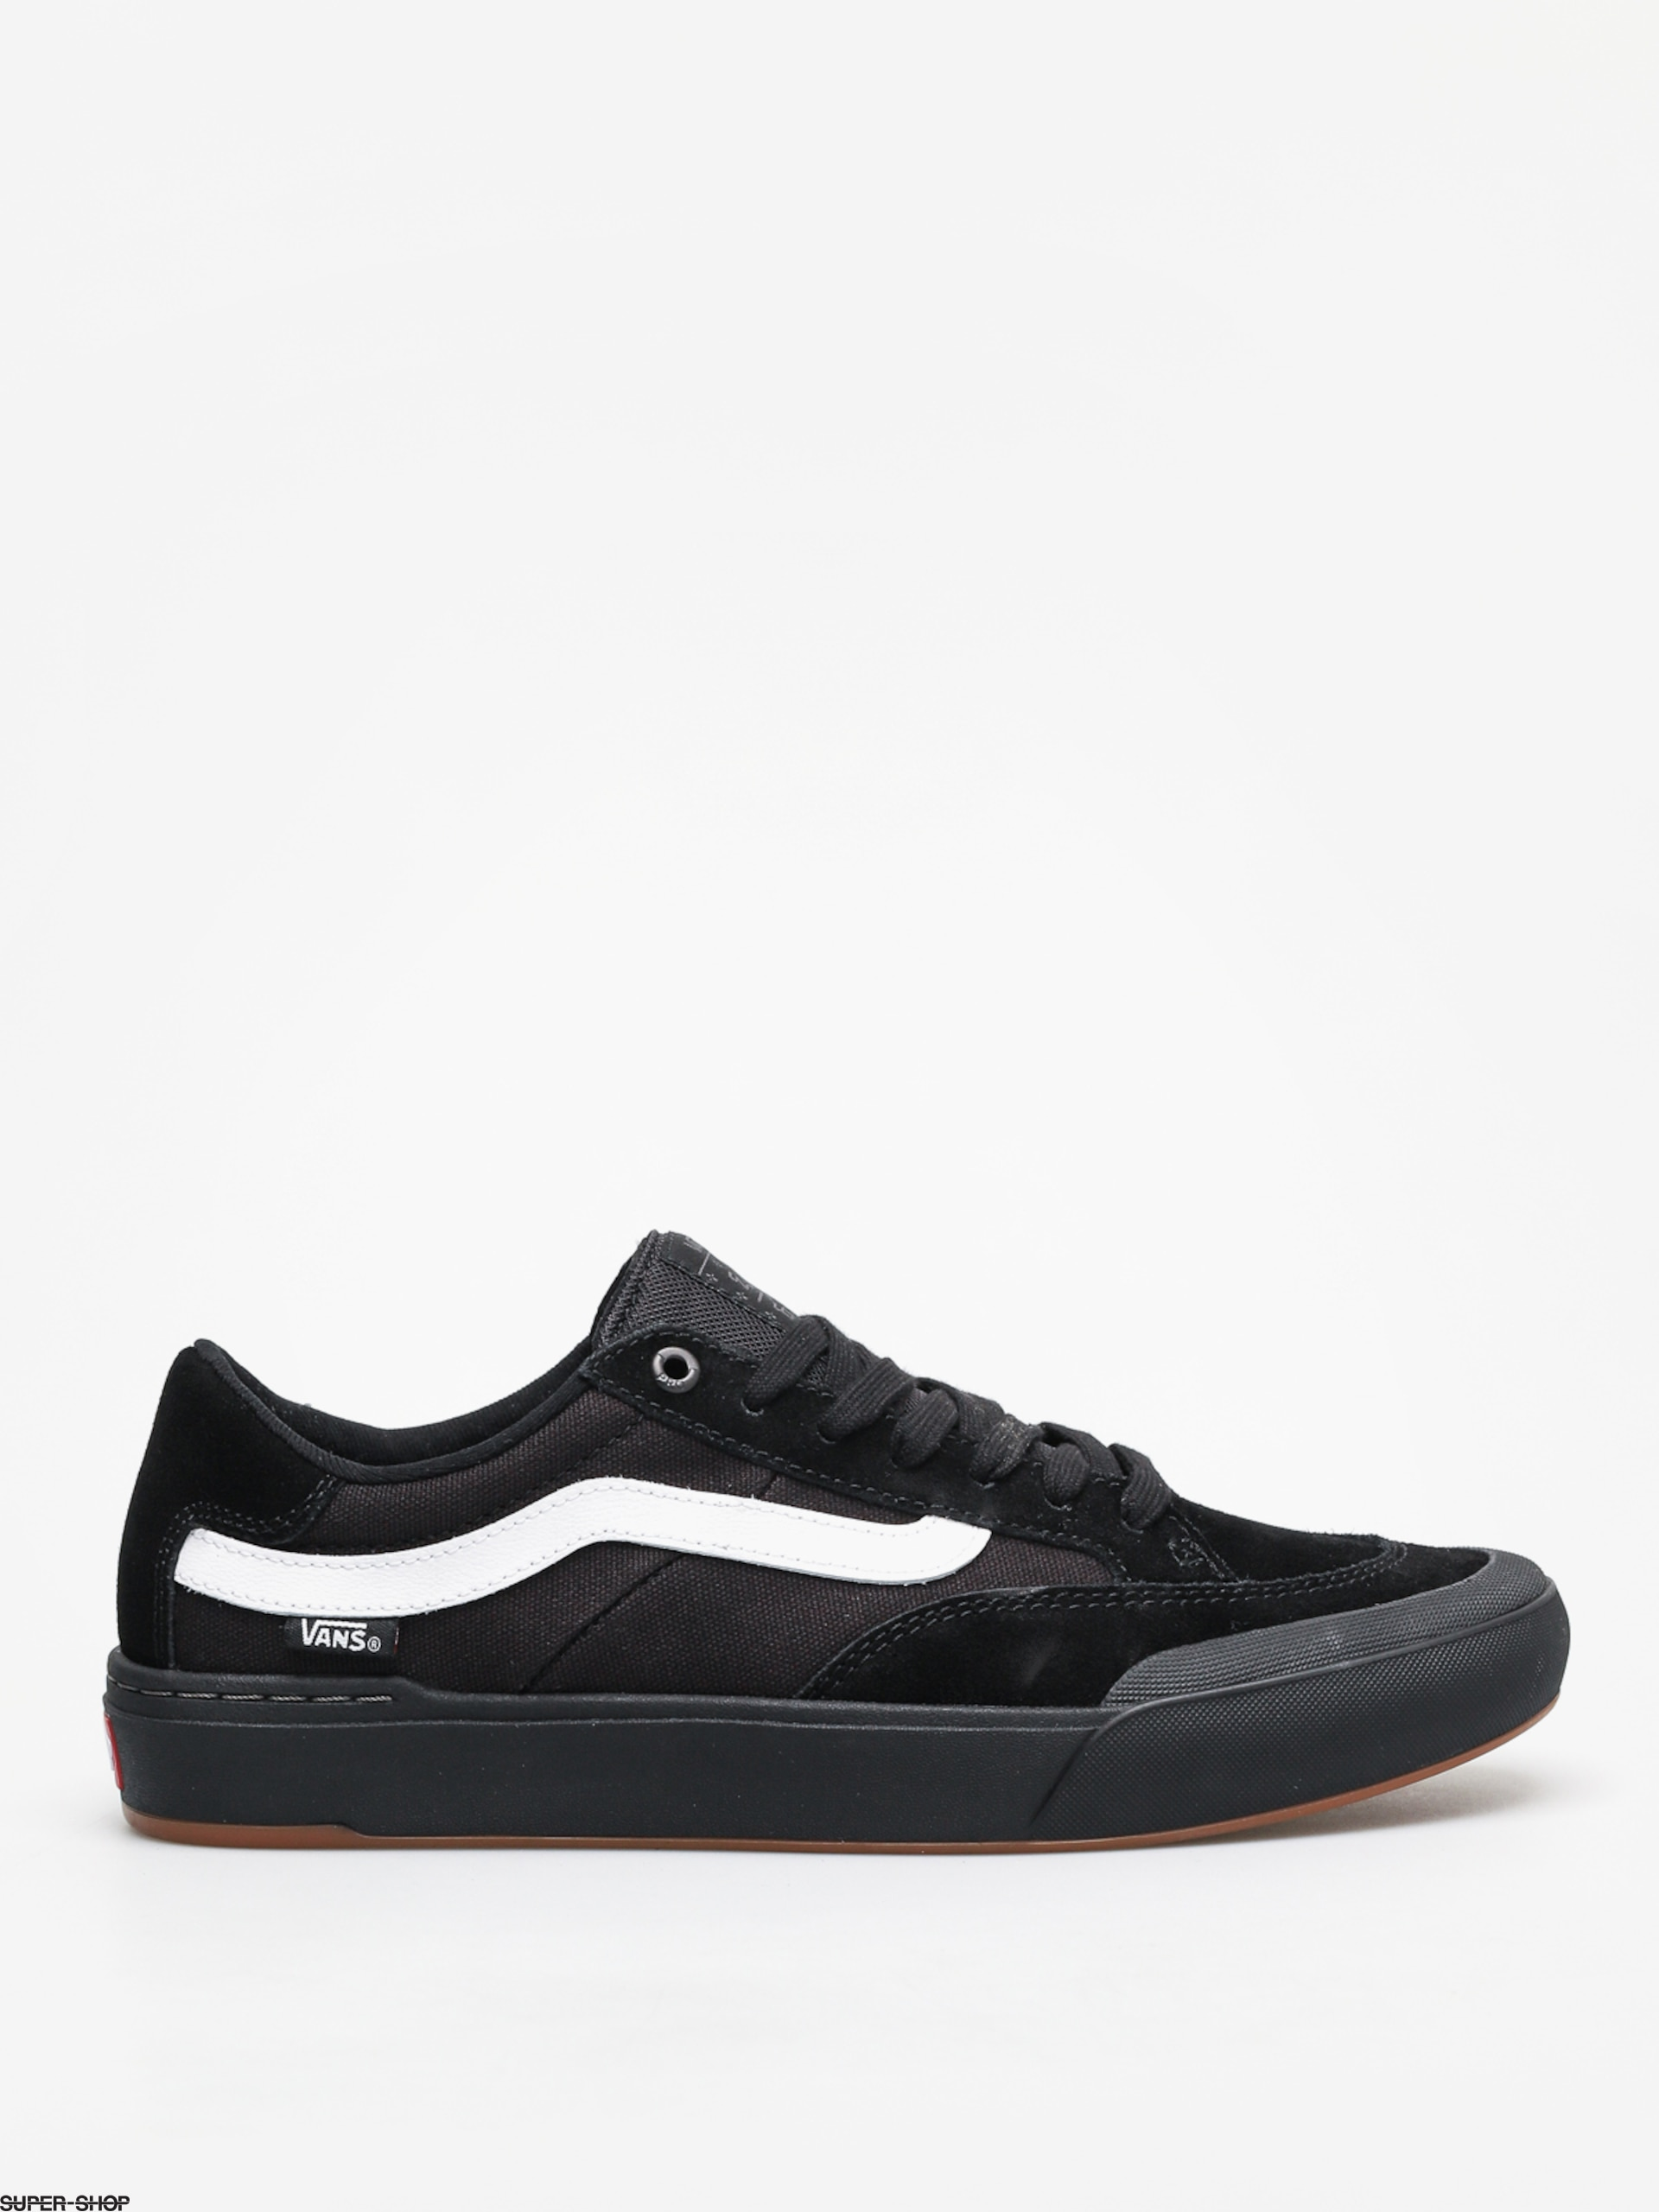 b128059bfb6ec5 Vans Berle Pro Shoes (black black white)